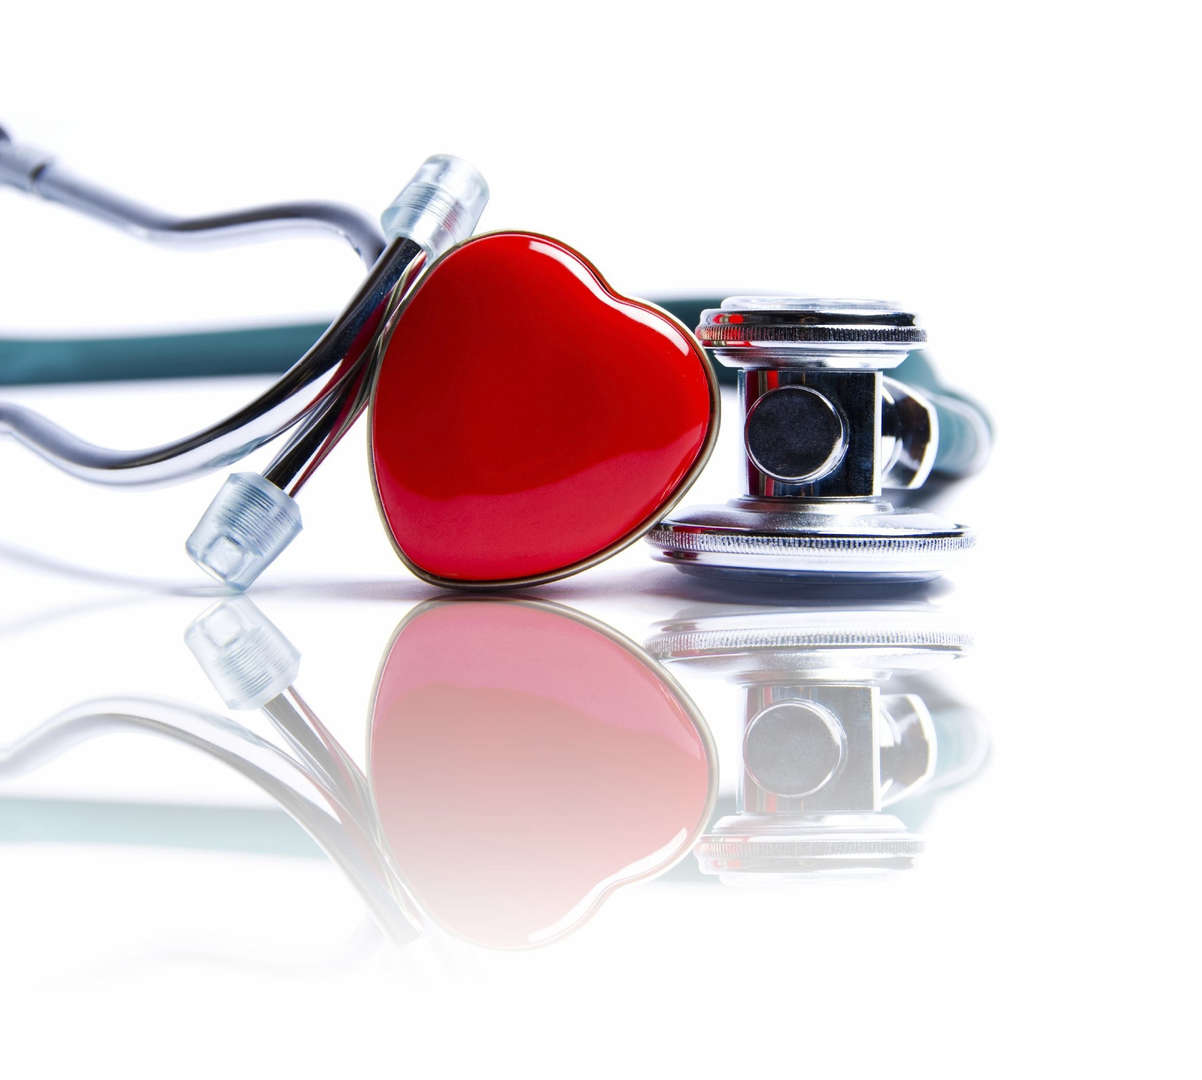 Health cover photo